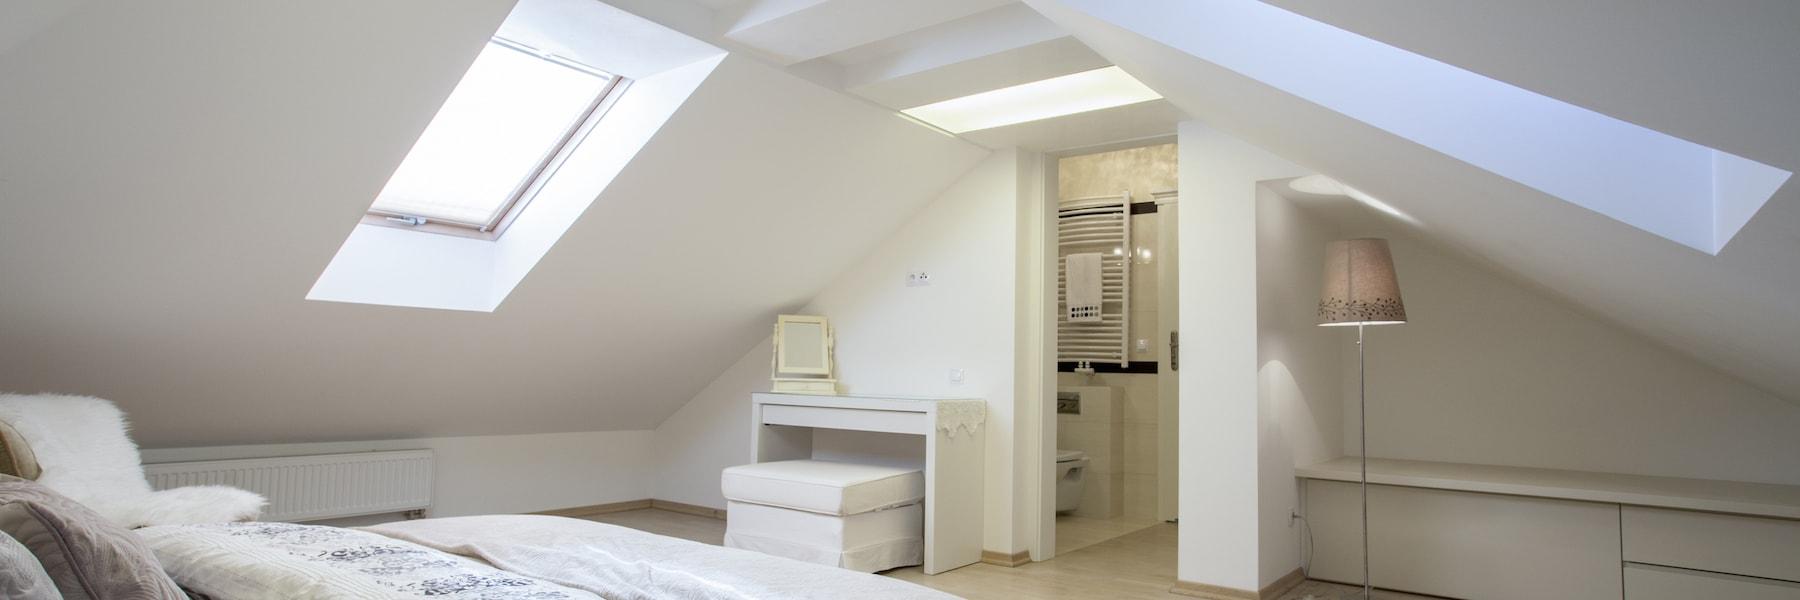 Loft Conversions In Brighton Hove Shoreham Worthing And